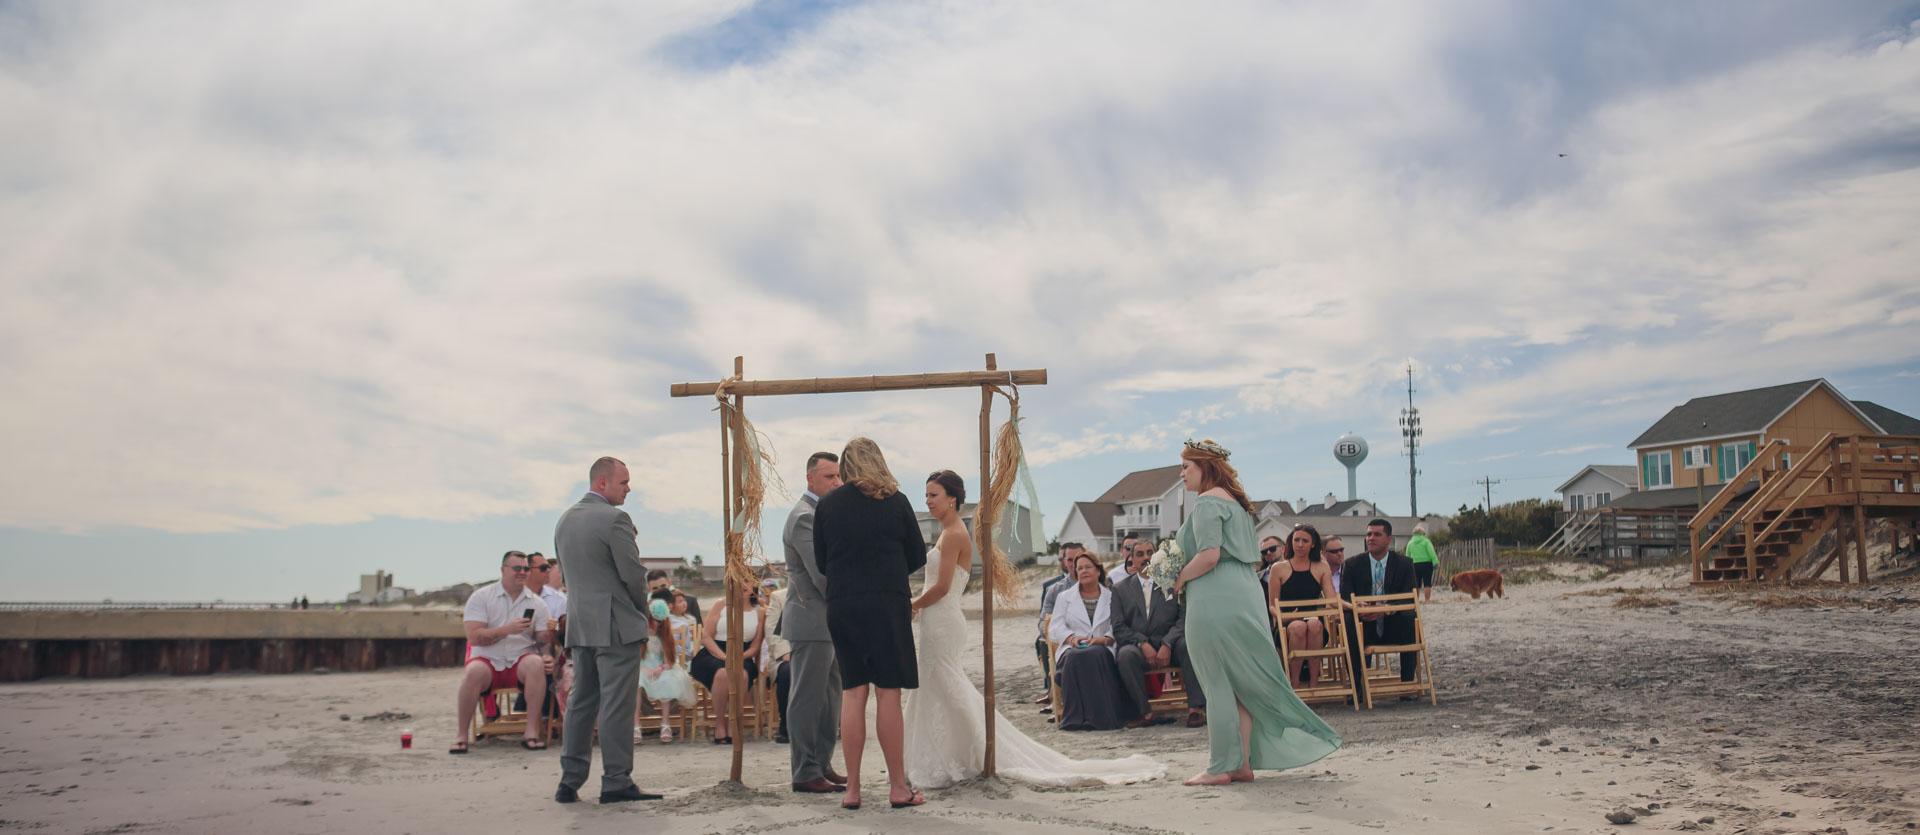 Mora Ceremony